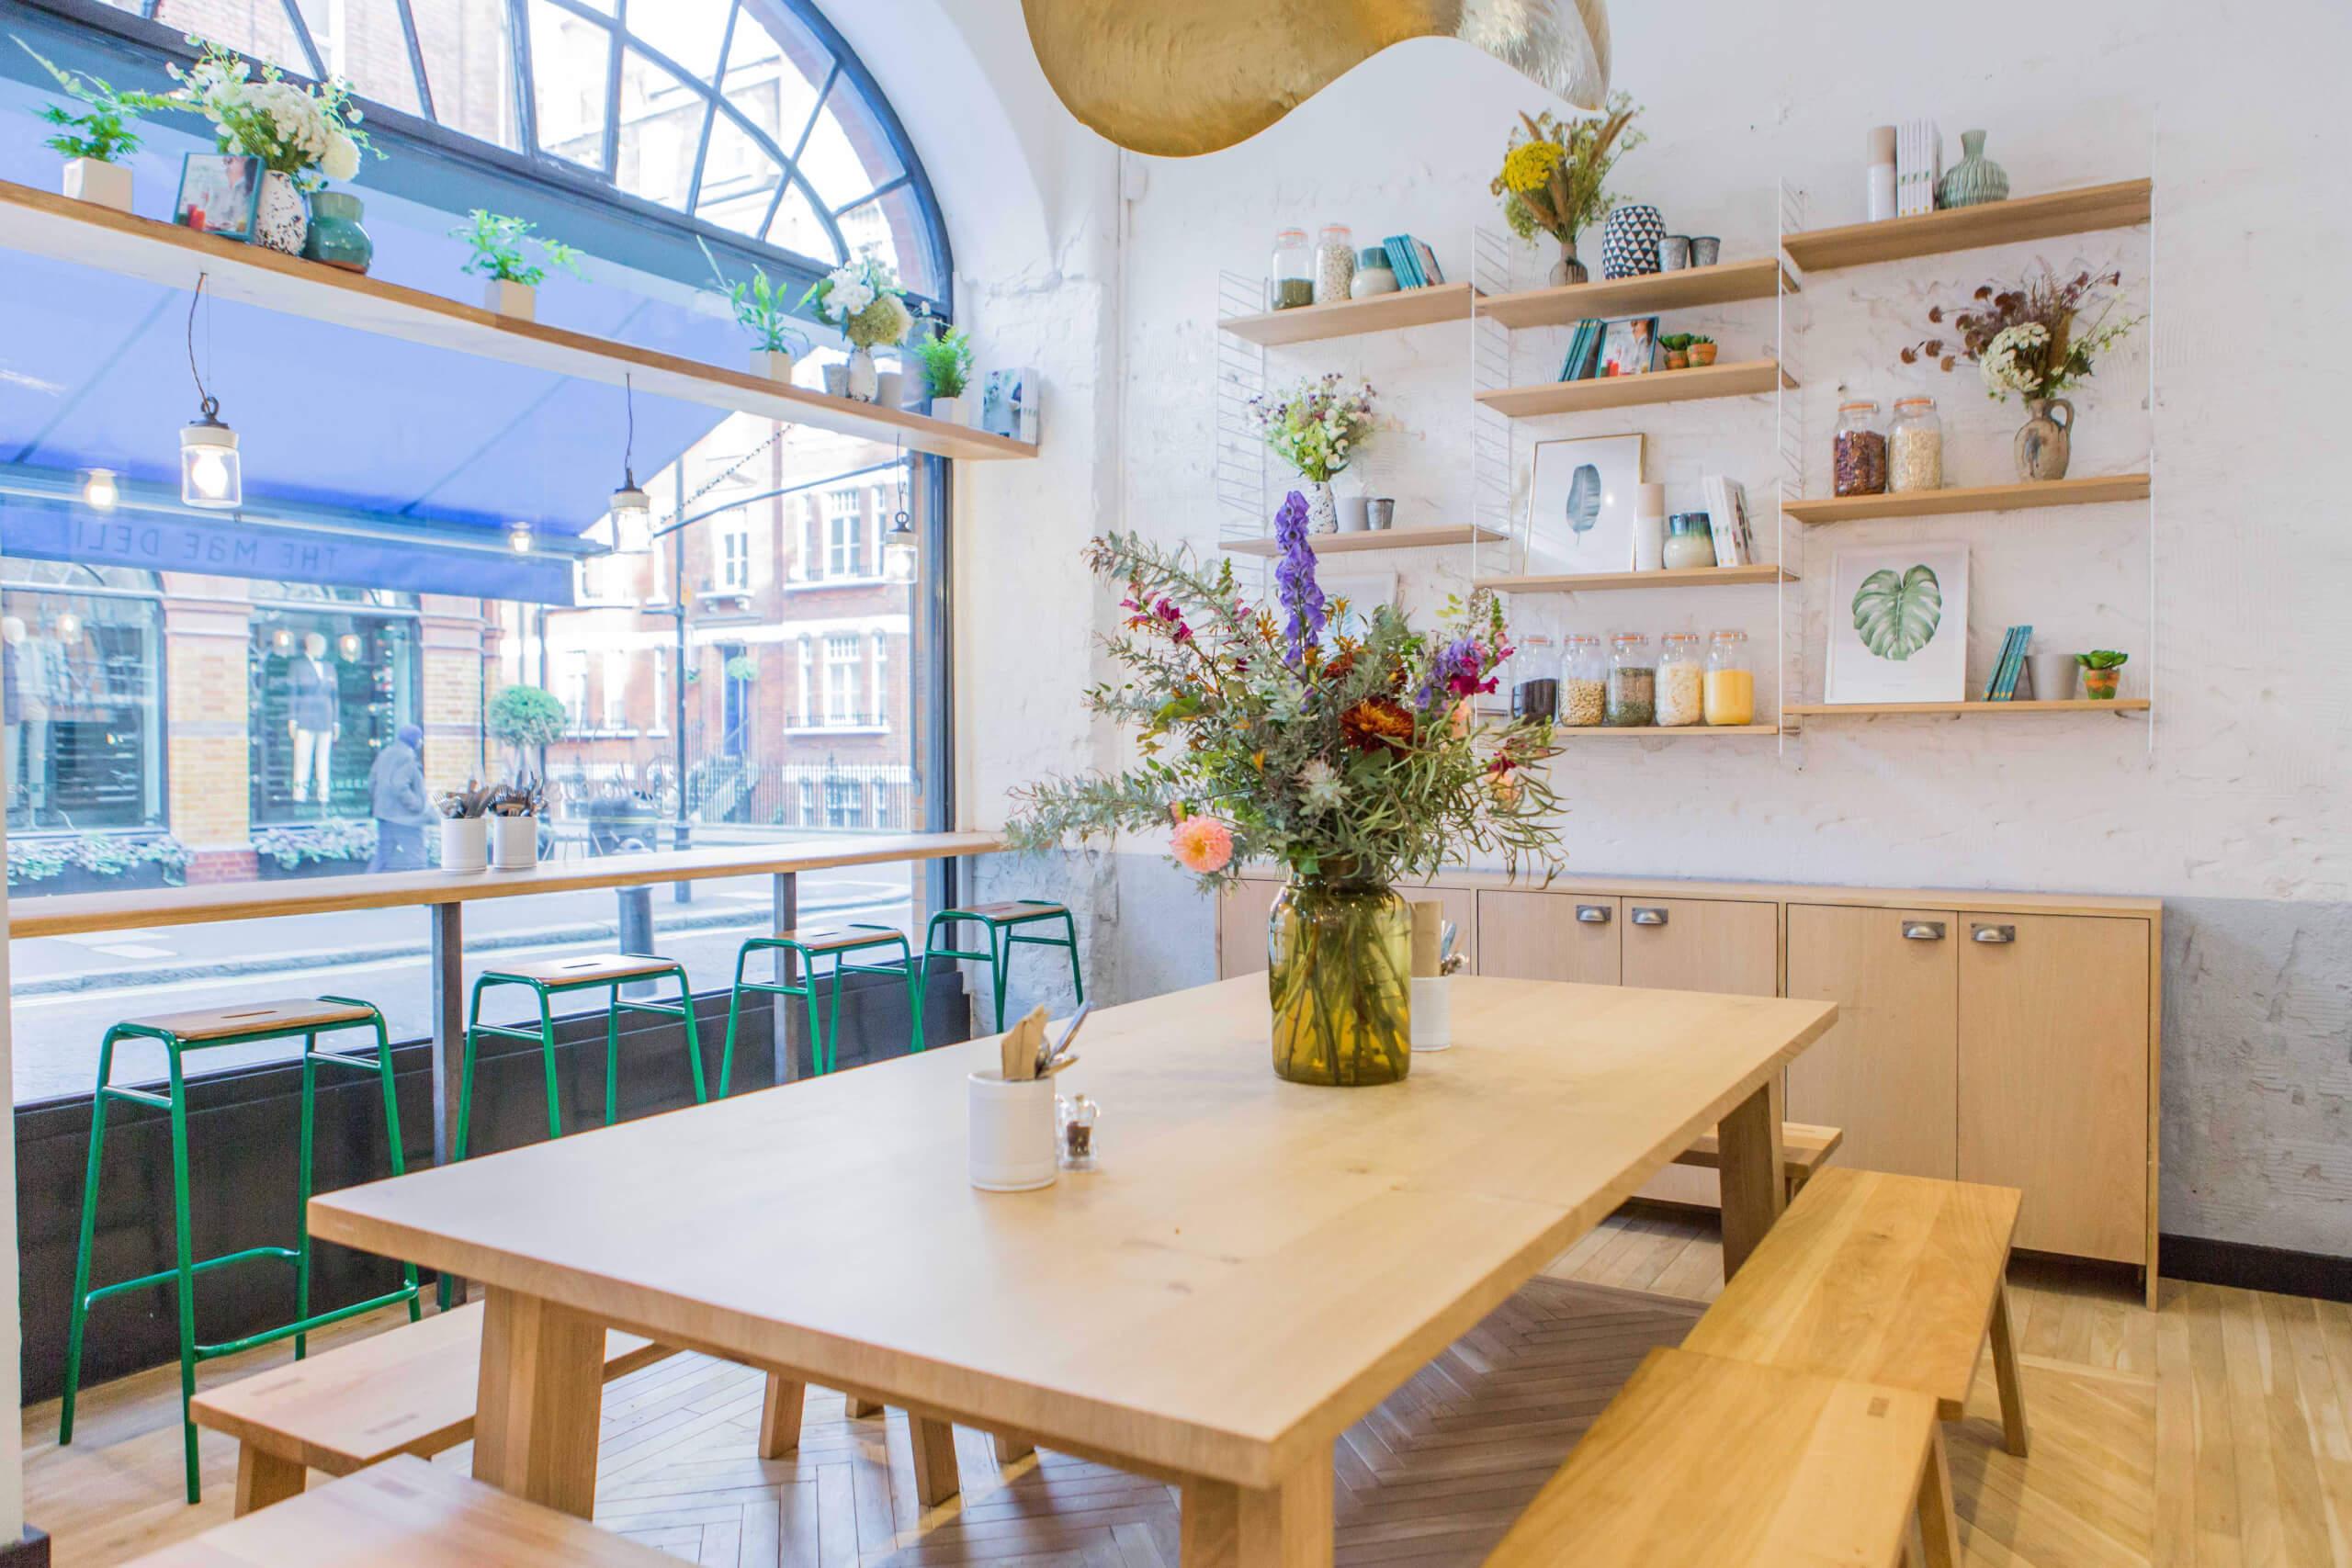 new restaurants in london, best new restaurants in london, london new restaurants, new restaurants east london, london best new restaurants, top new restaurants in london, new restaurants in soho london, new restaurants in east london, best new restaurants east london, new london restaurants, new top restaurants in london, london restaurants new